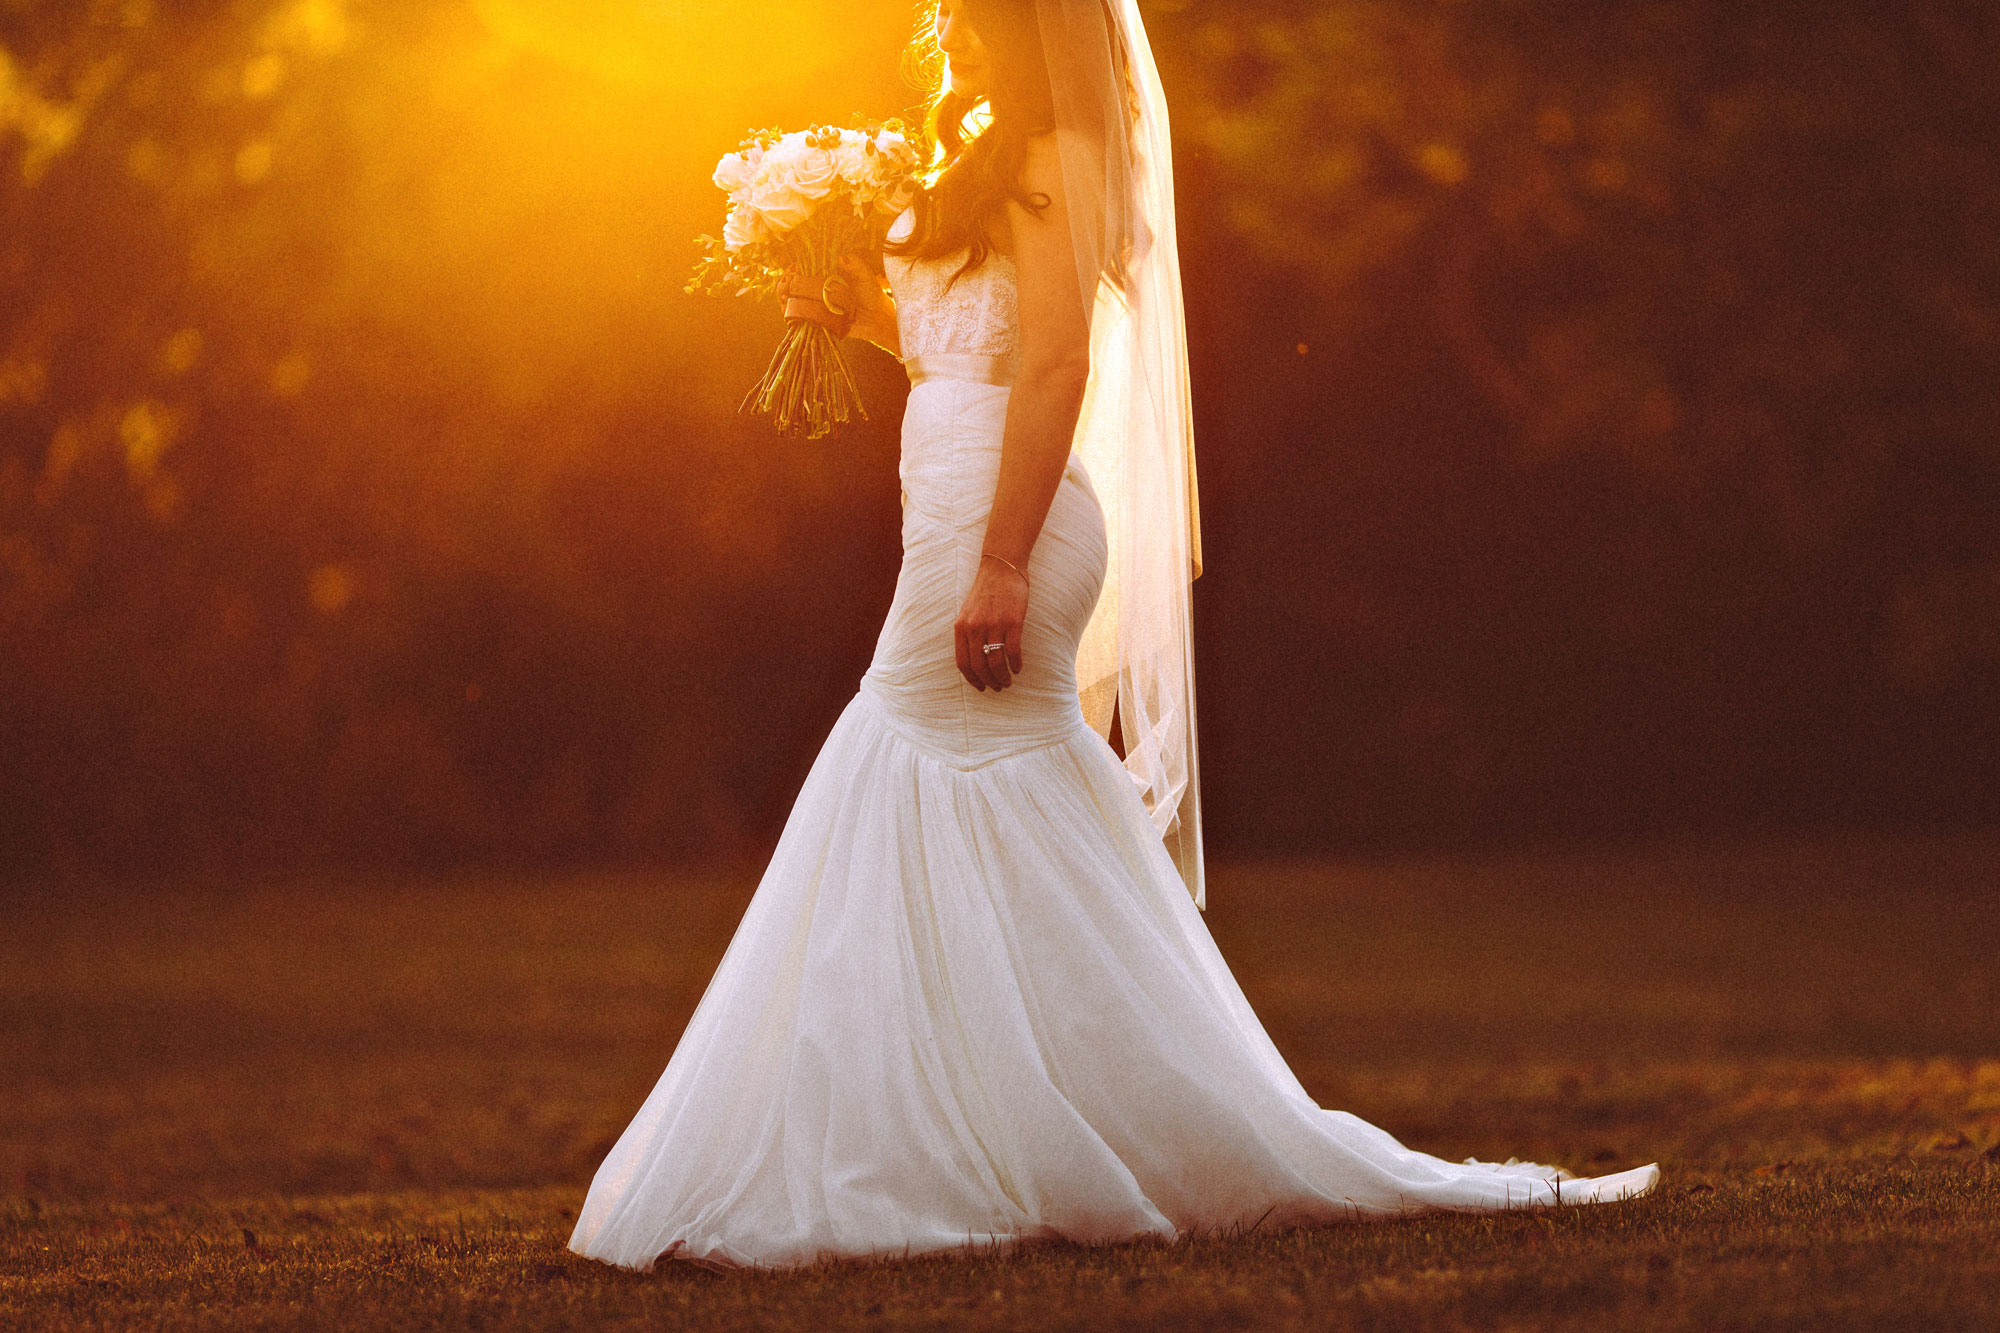 Me & Mr. Jones Wedding, Watters Carina Corset, Watters Amina Skirt, Bridal Separates, Farm Wedding, Black Tie Wedding, Nashville Wedding